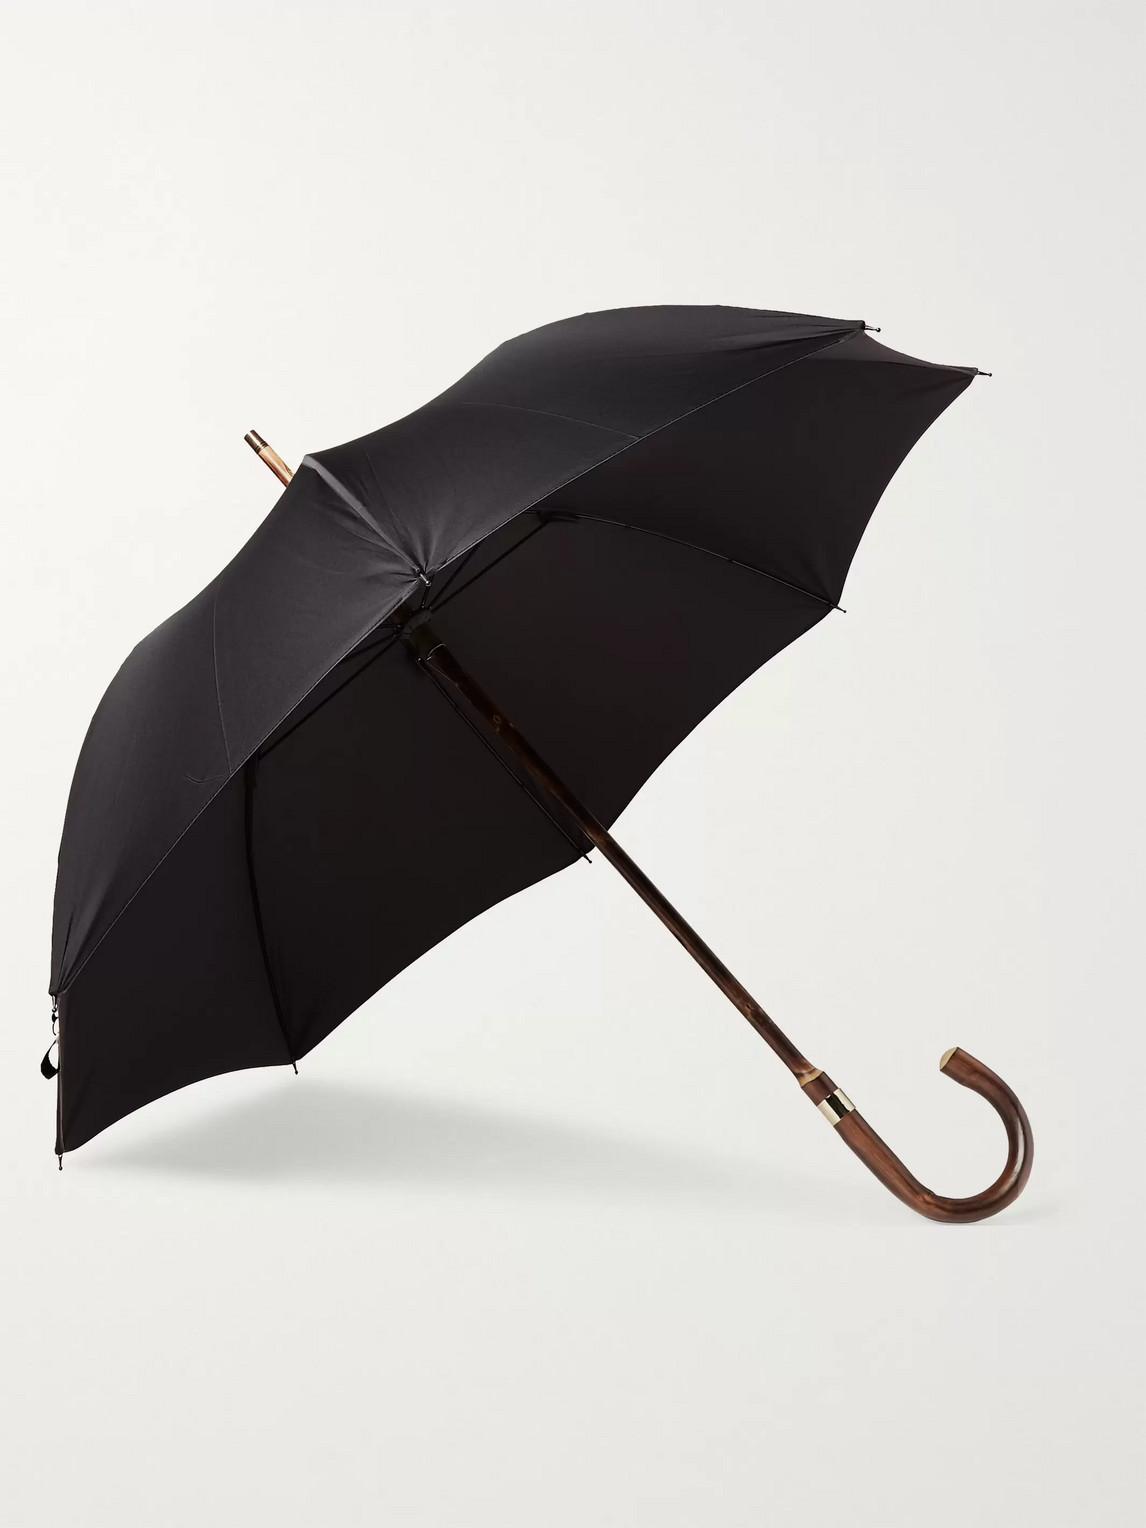 Kingsman London Undercover Chestnut Wood-handle Umbrella In Black